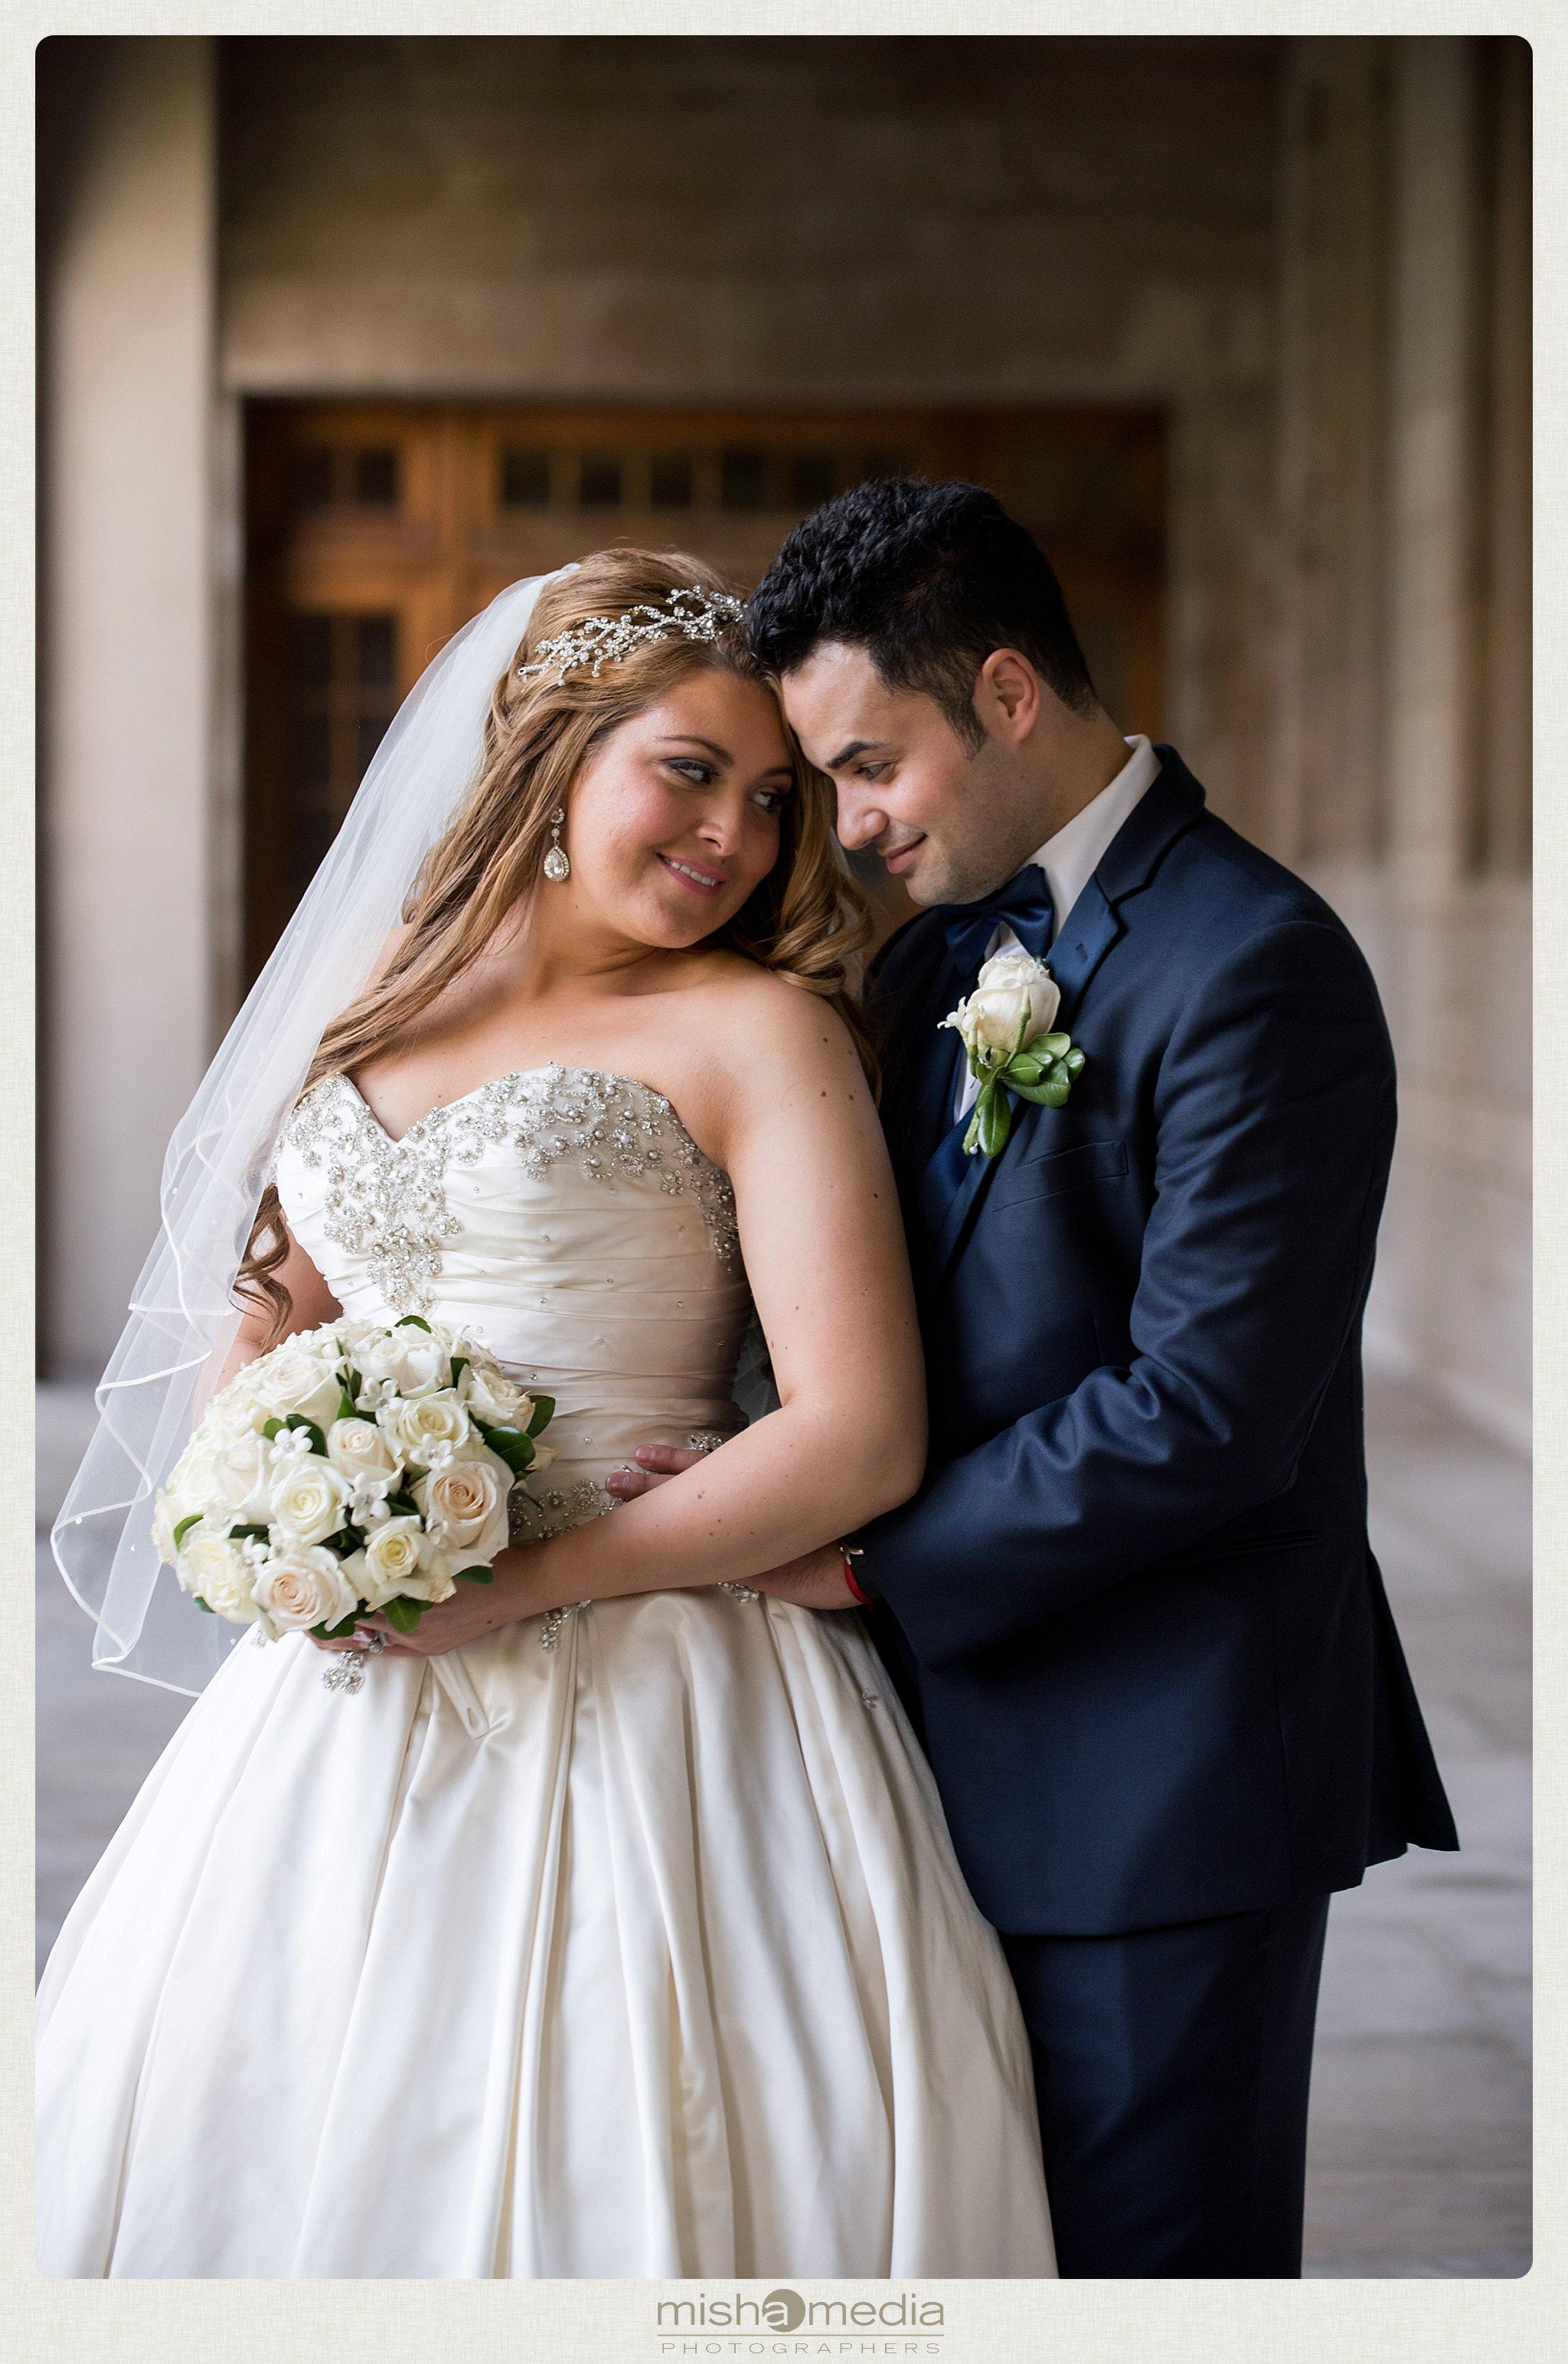 Wedding-Photos-at-Dominican-University_0001.jpg